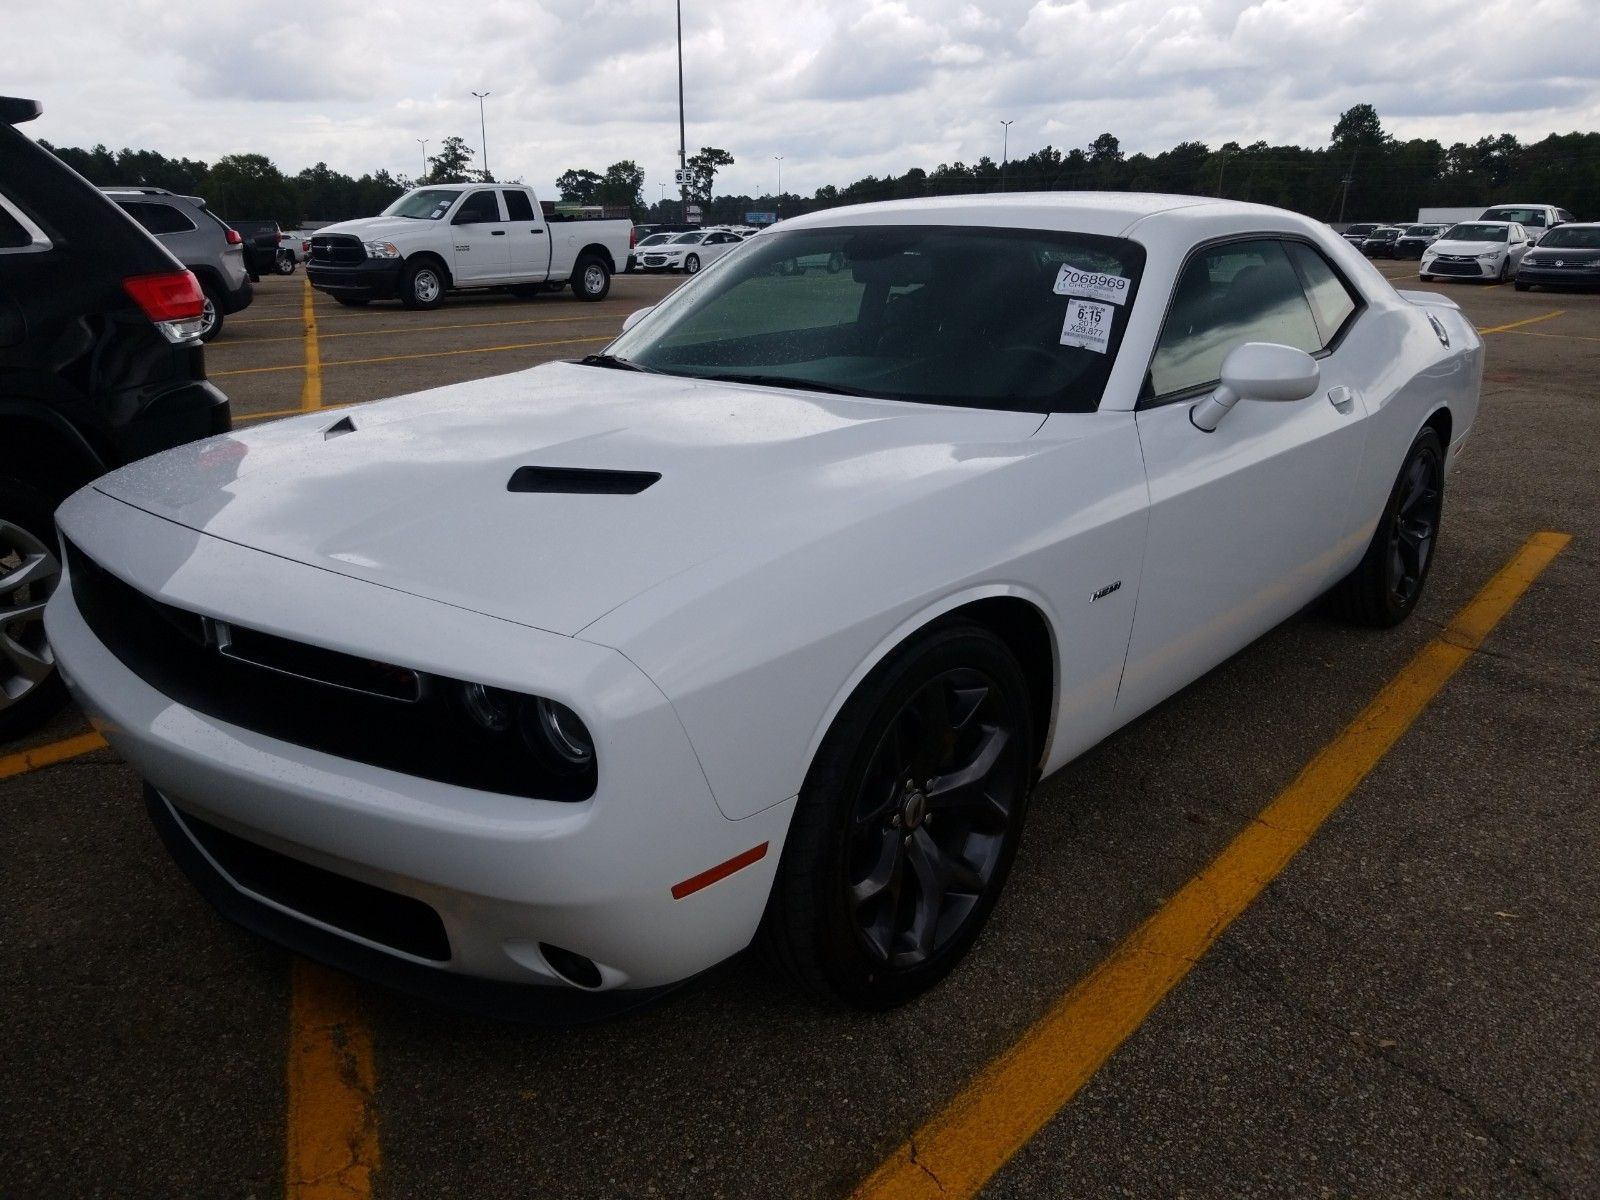 2017 Dodge Challenger 5.7. Lot 999204936652 Vin 2C3CDZBT6HH613457